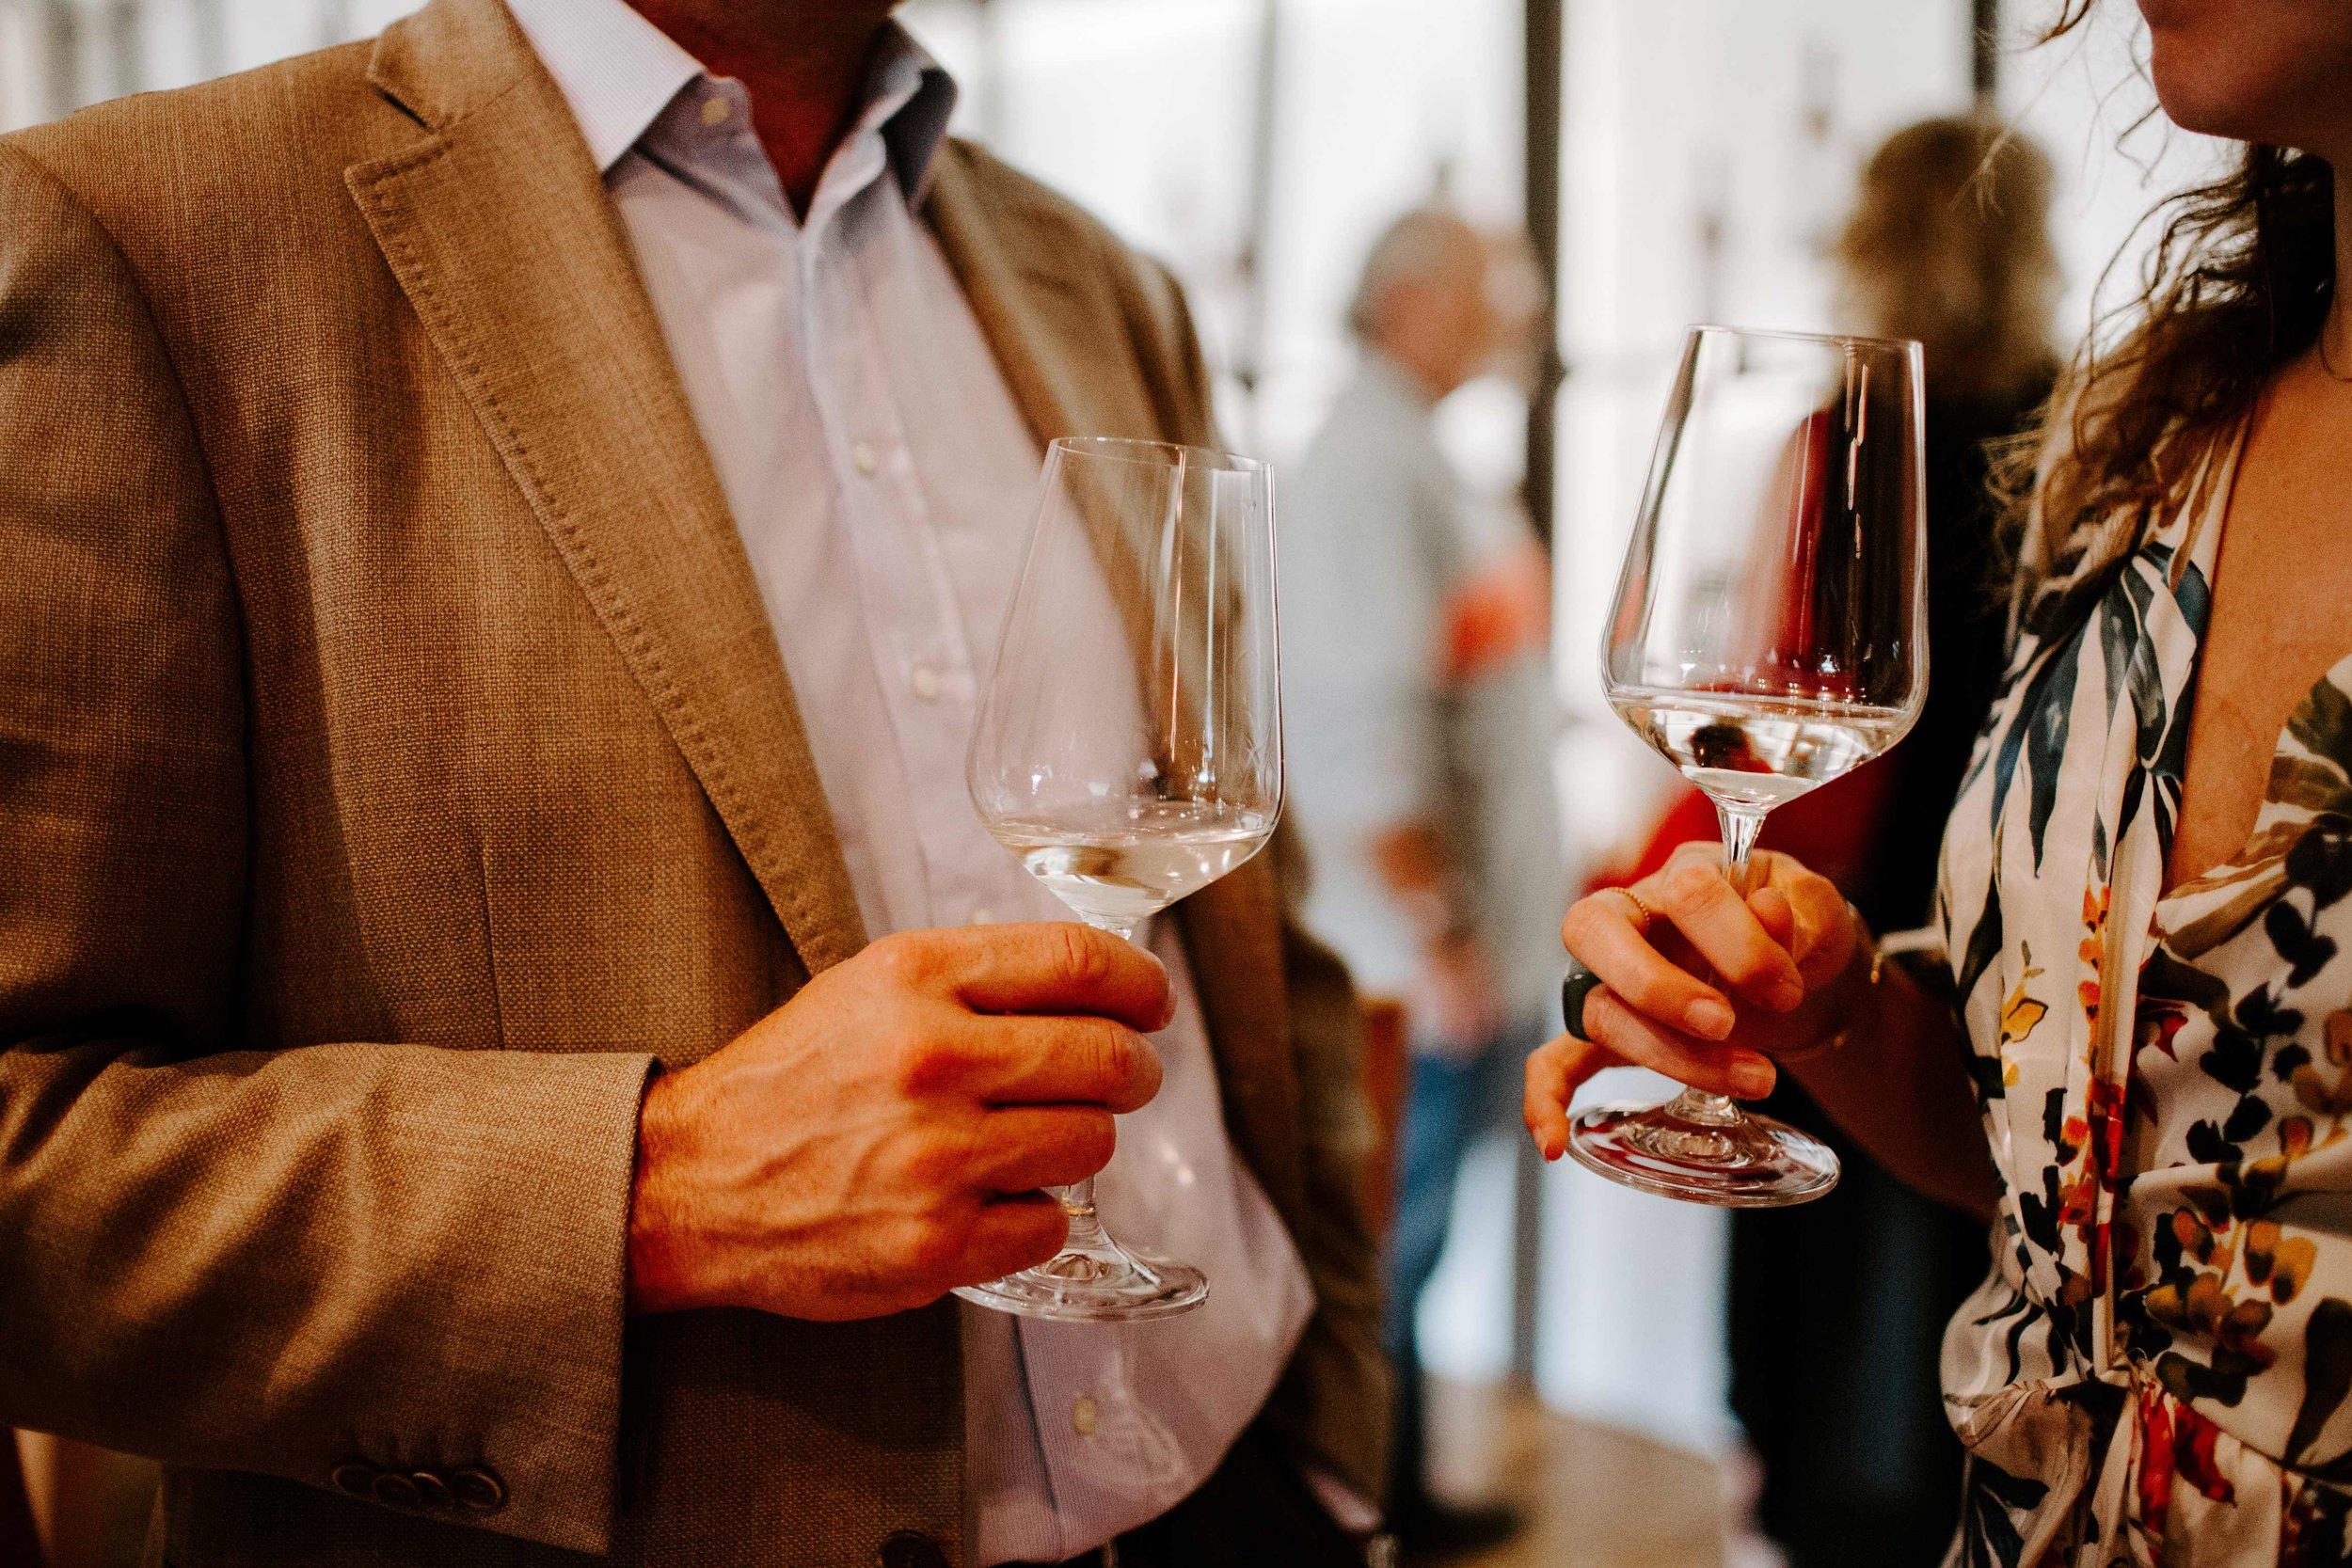 piedmont wine tasting tour